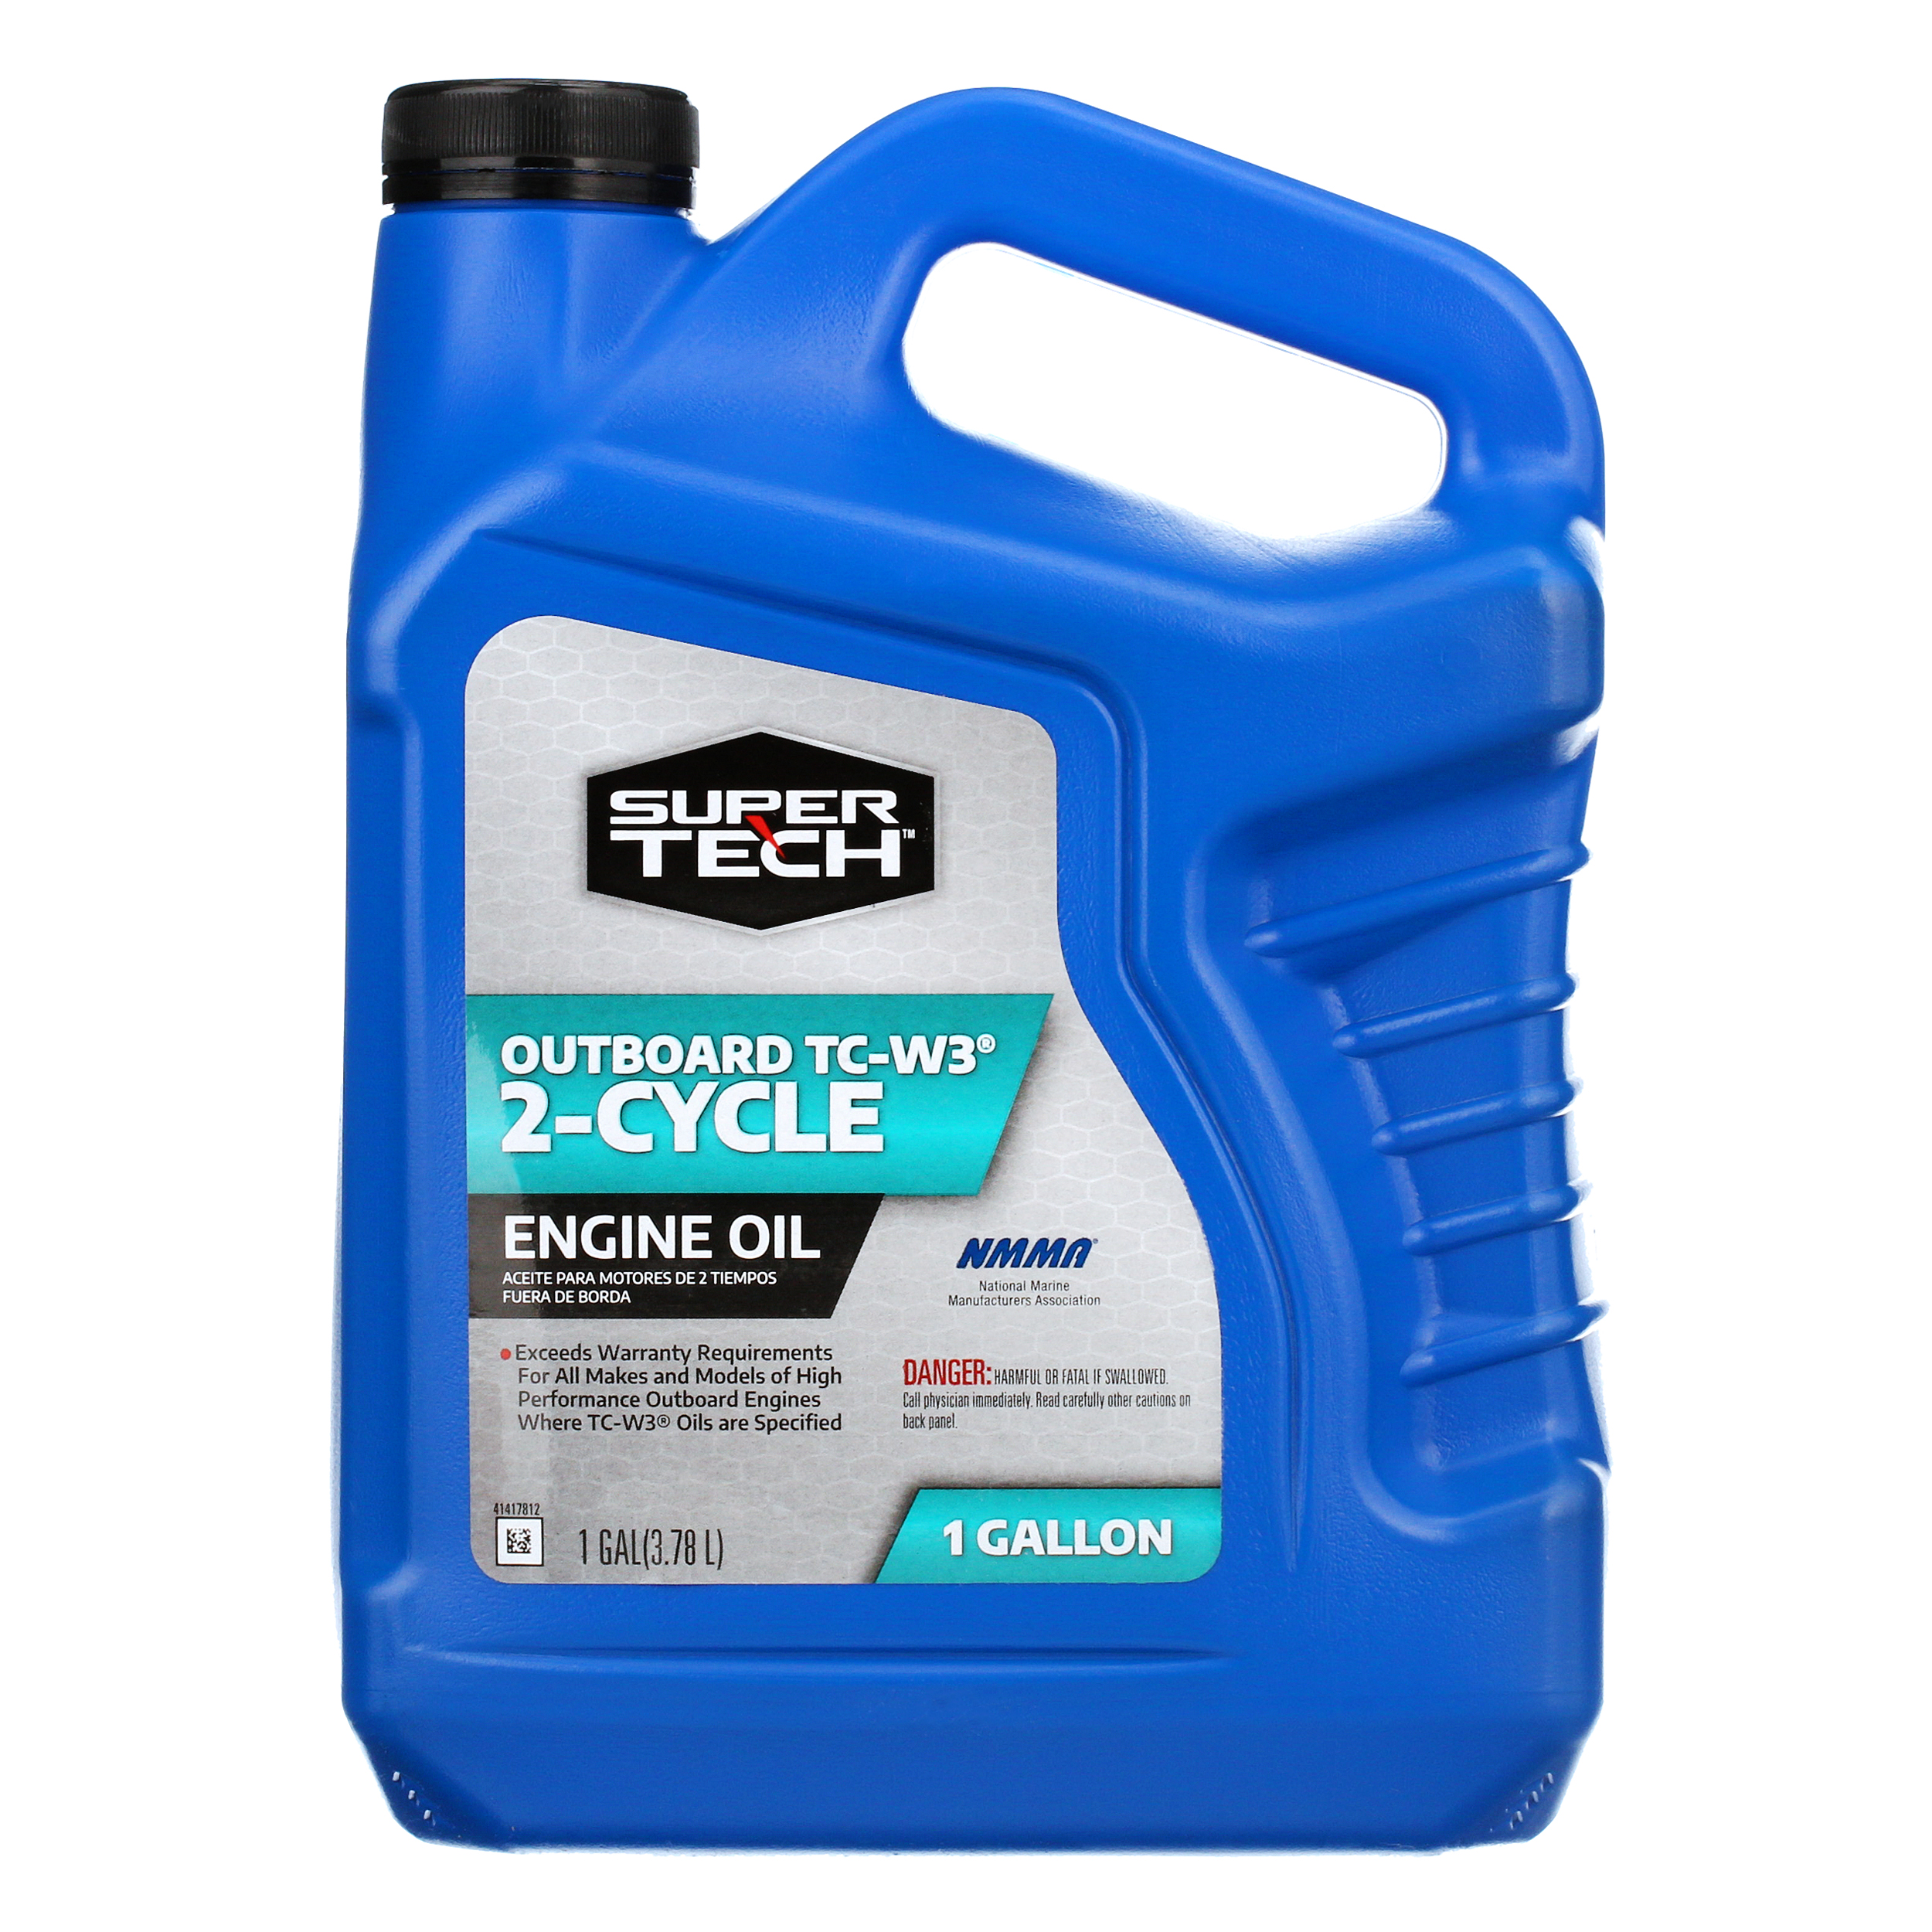 Super Tech TC-W3 Outboard 2-Cycle Engine Oil, 1 Gallon - Walmart